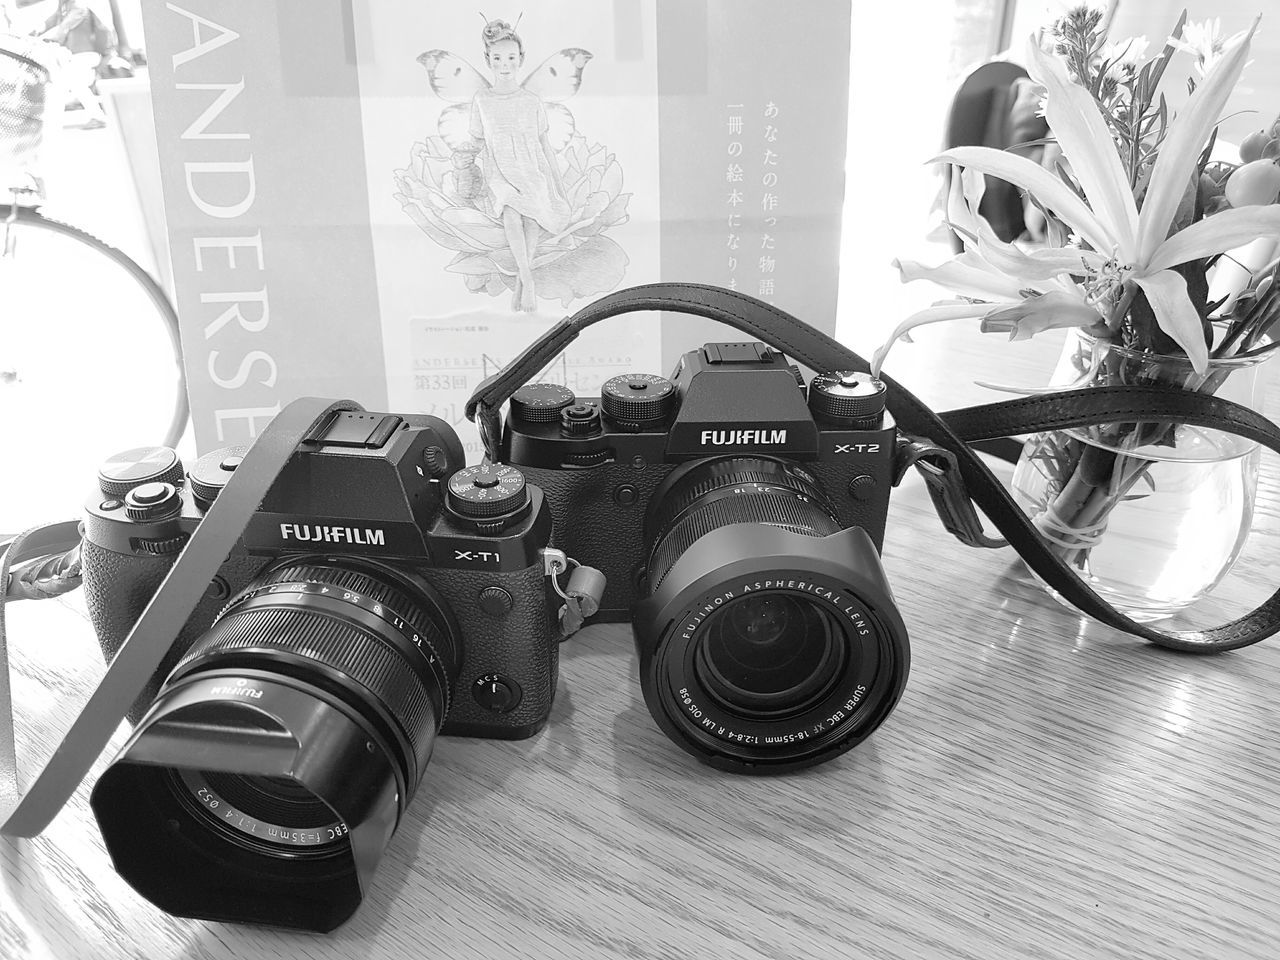 With Fujifilm Fotography Flower Fuji X-T1 FUJIFILM X-T2 Camera Work Fun